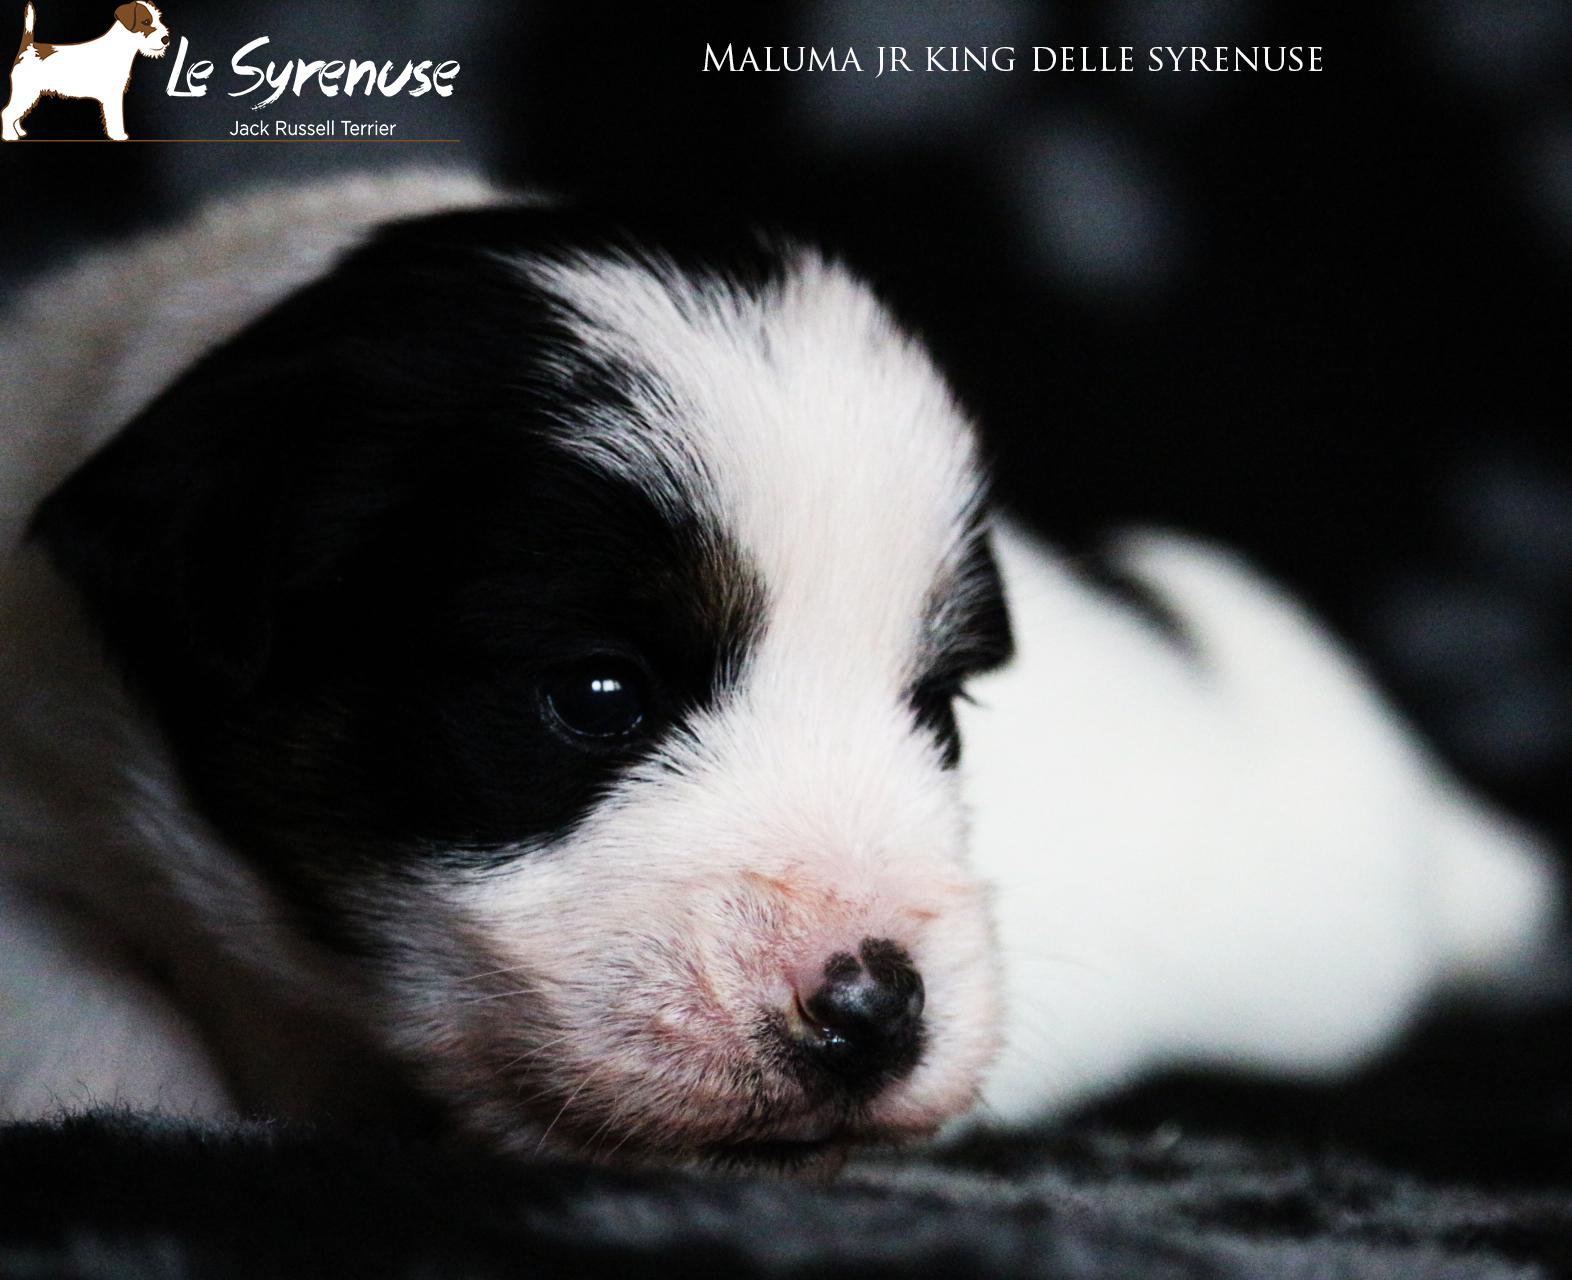 Maschio 1 Maluma Jr King delle Syrenuse